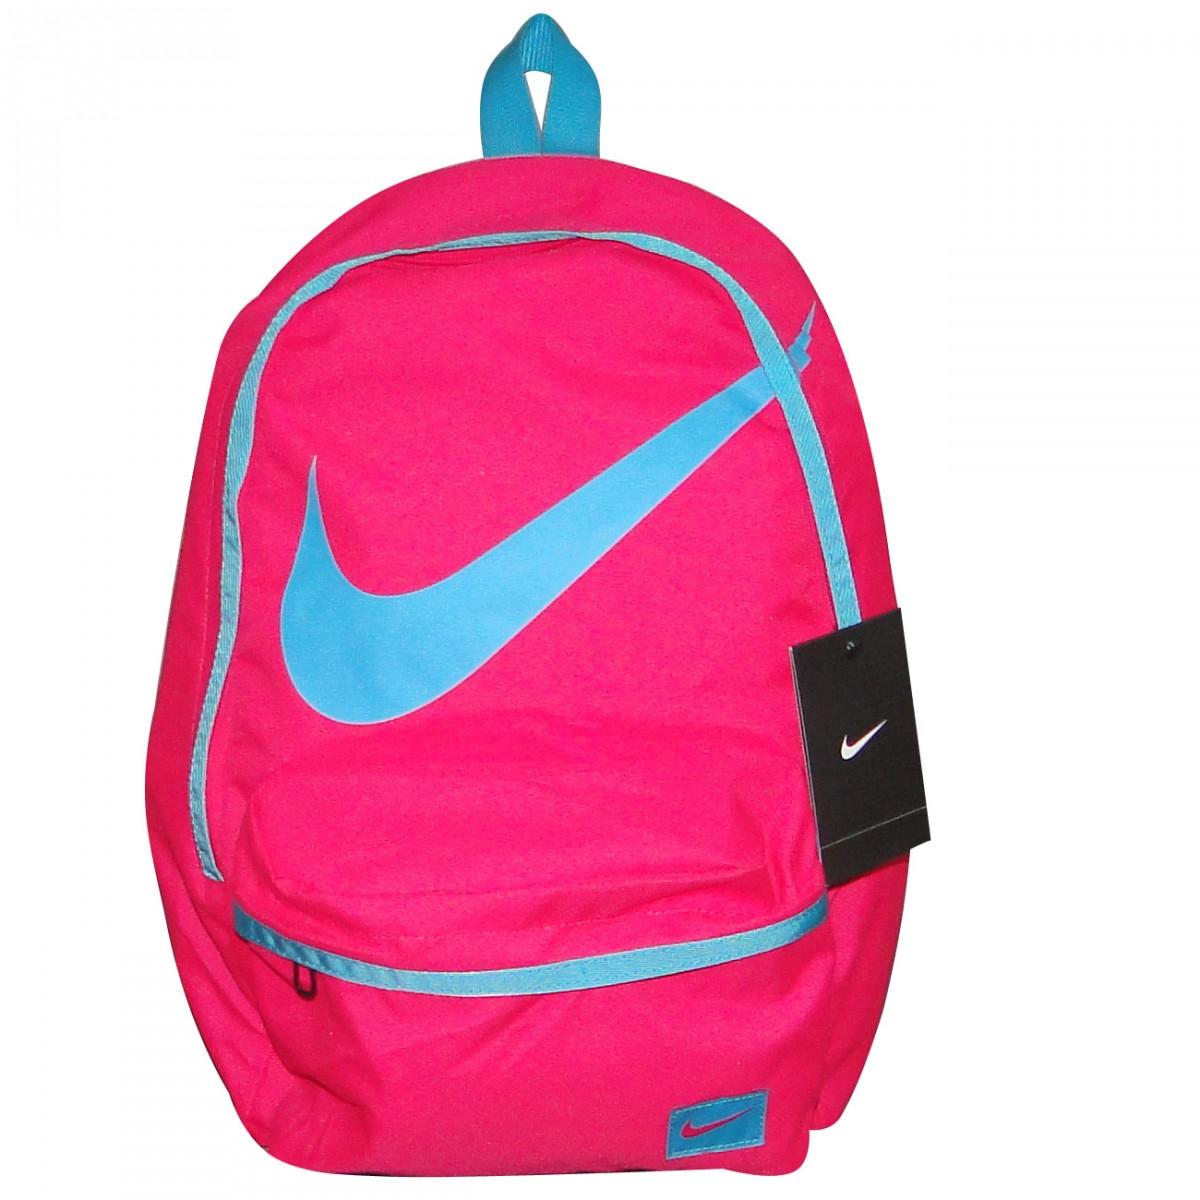 476f0a14b Mochila Nike Ref.Ba4665 BA4665-613 - Pink/Azul - Chuteira Nike ...